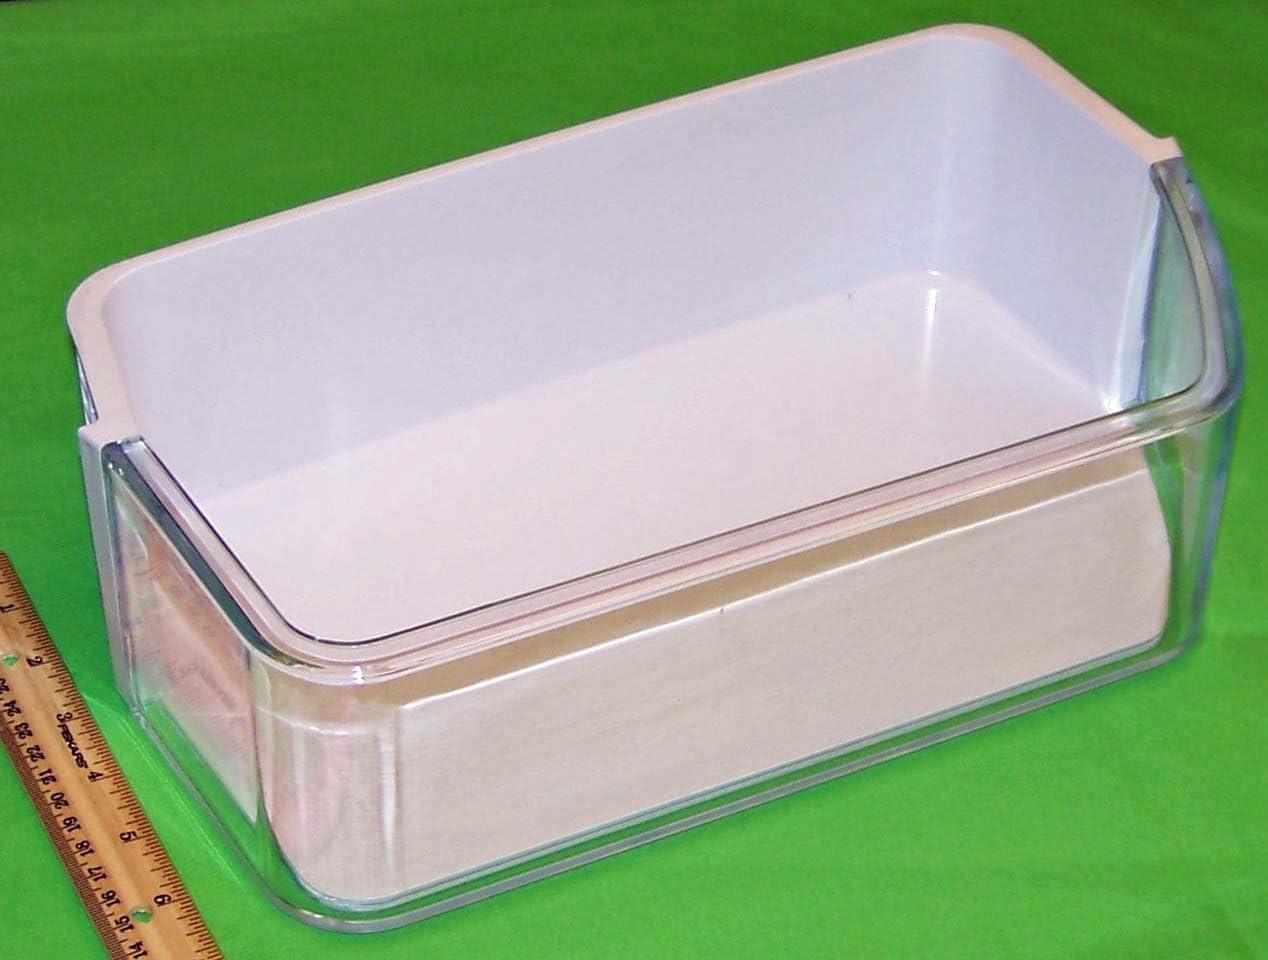 RF268ACWP//XAA RF268ACRS//XAA RF268ACWP OEM Samsung Refrigerator Door Bin Basket Shelf Tray Shipped With RF268ACRS